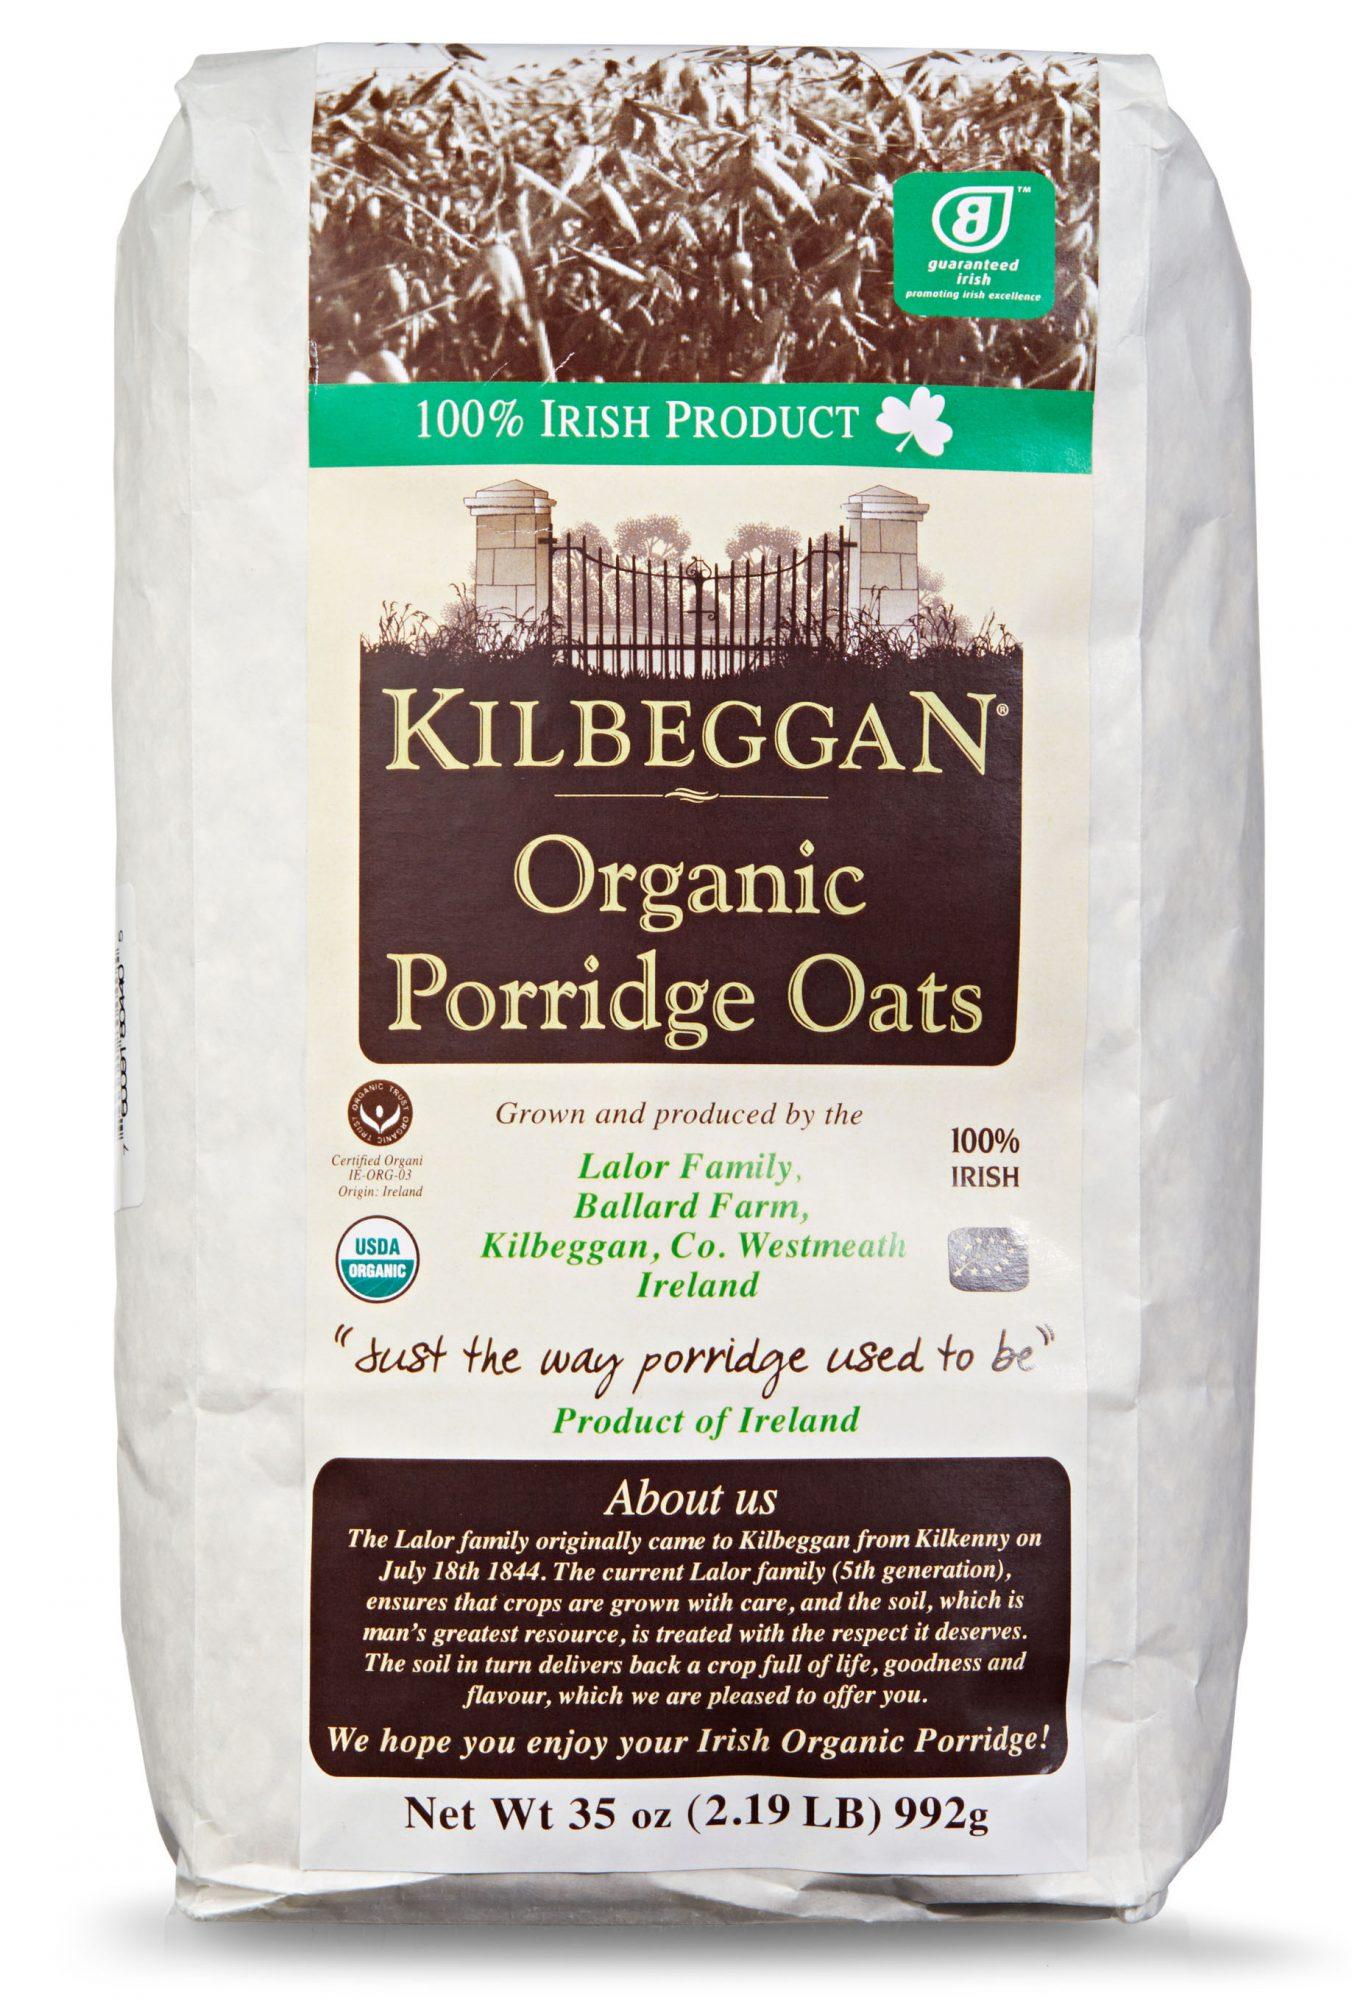 Kilbeggan Organic Porridge Oats